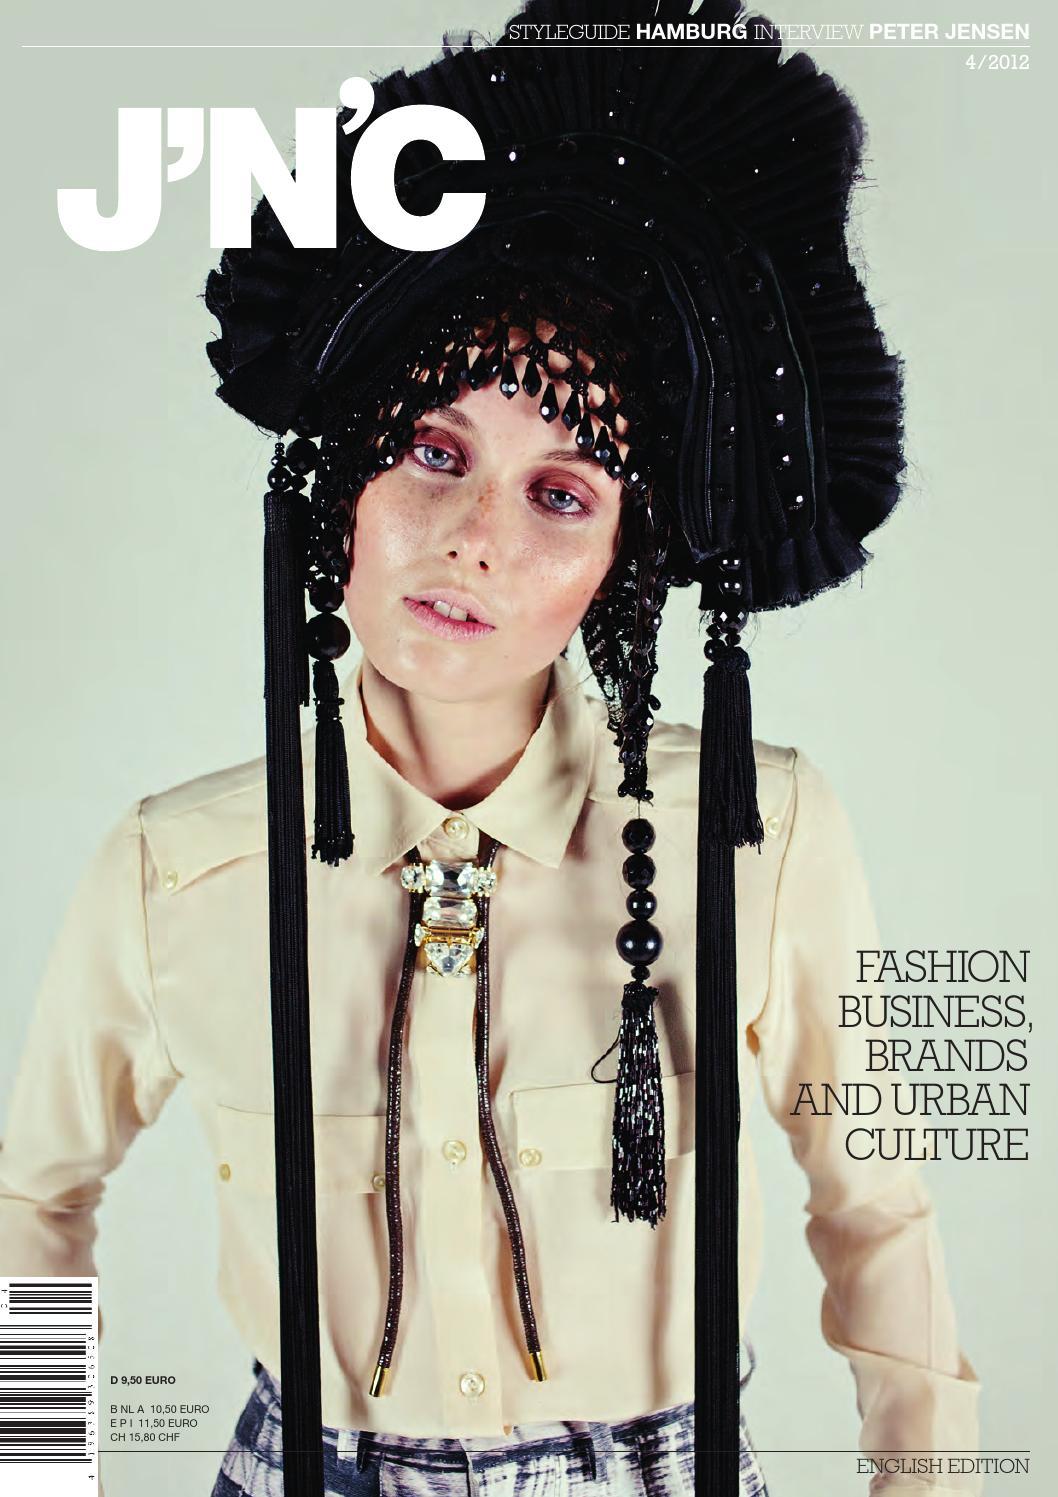 63f155c6ca2c J N C Magazine 4 2012 by J N C Magazine - issuu